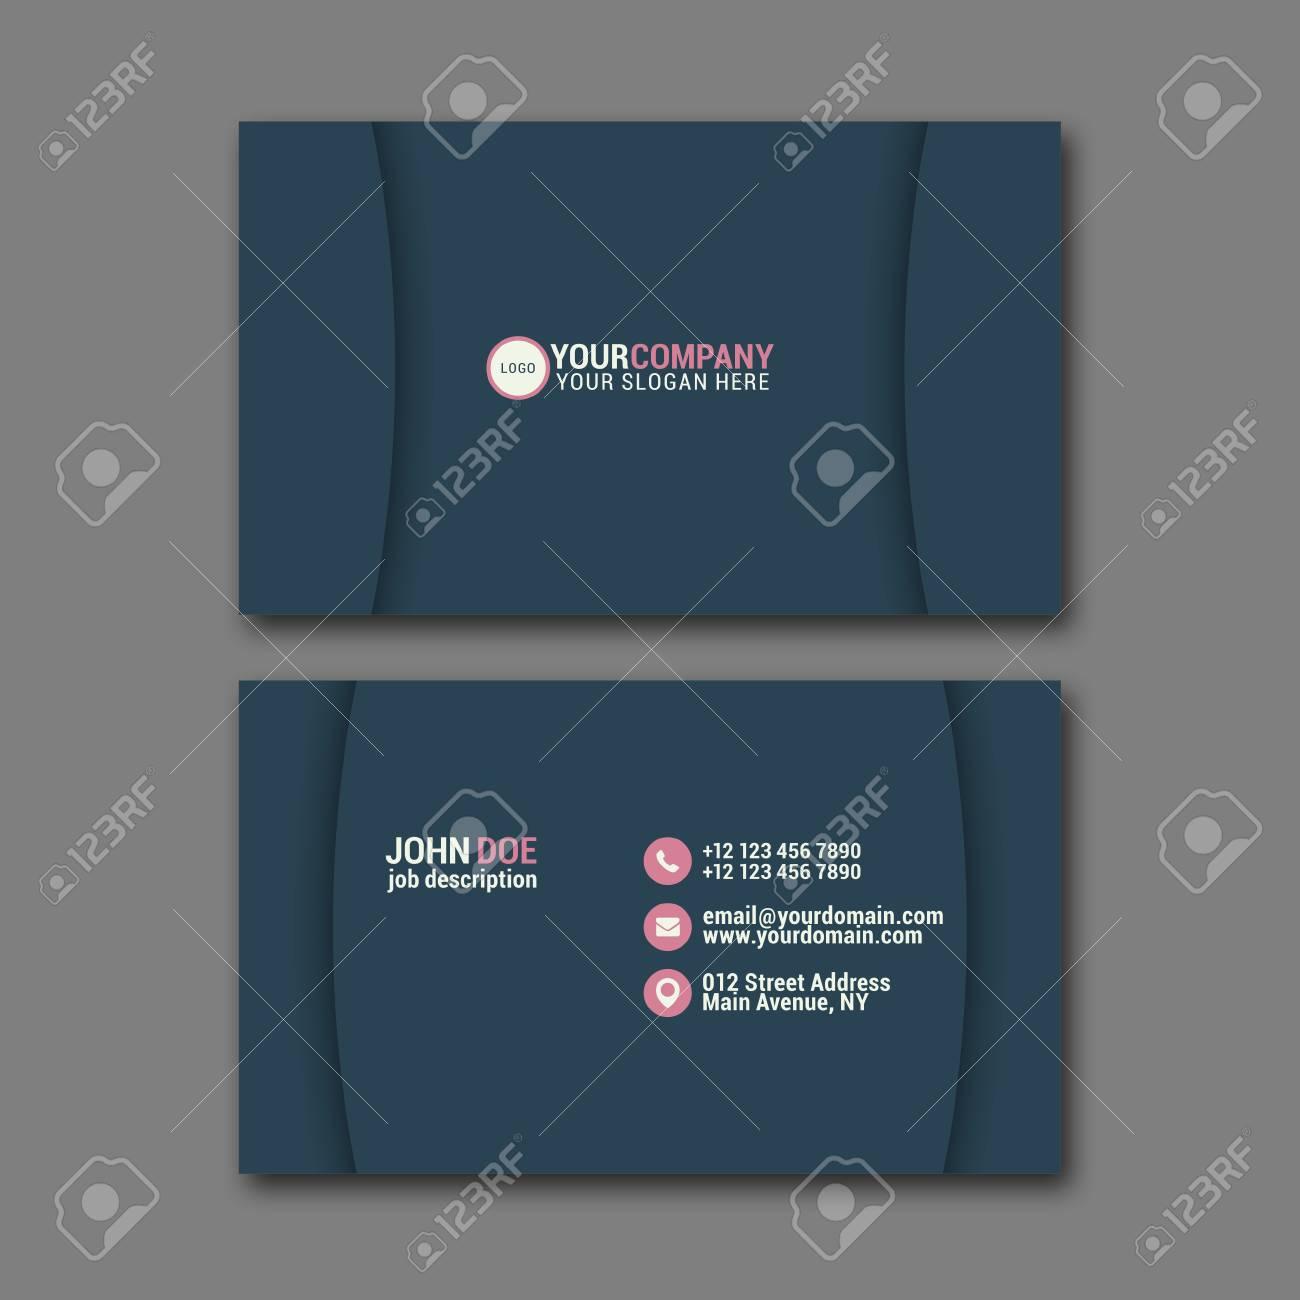 Elegant business card design template for creative design royalty banco de imagens elegant business card design template for creative design reheart Gallery